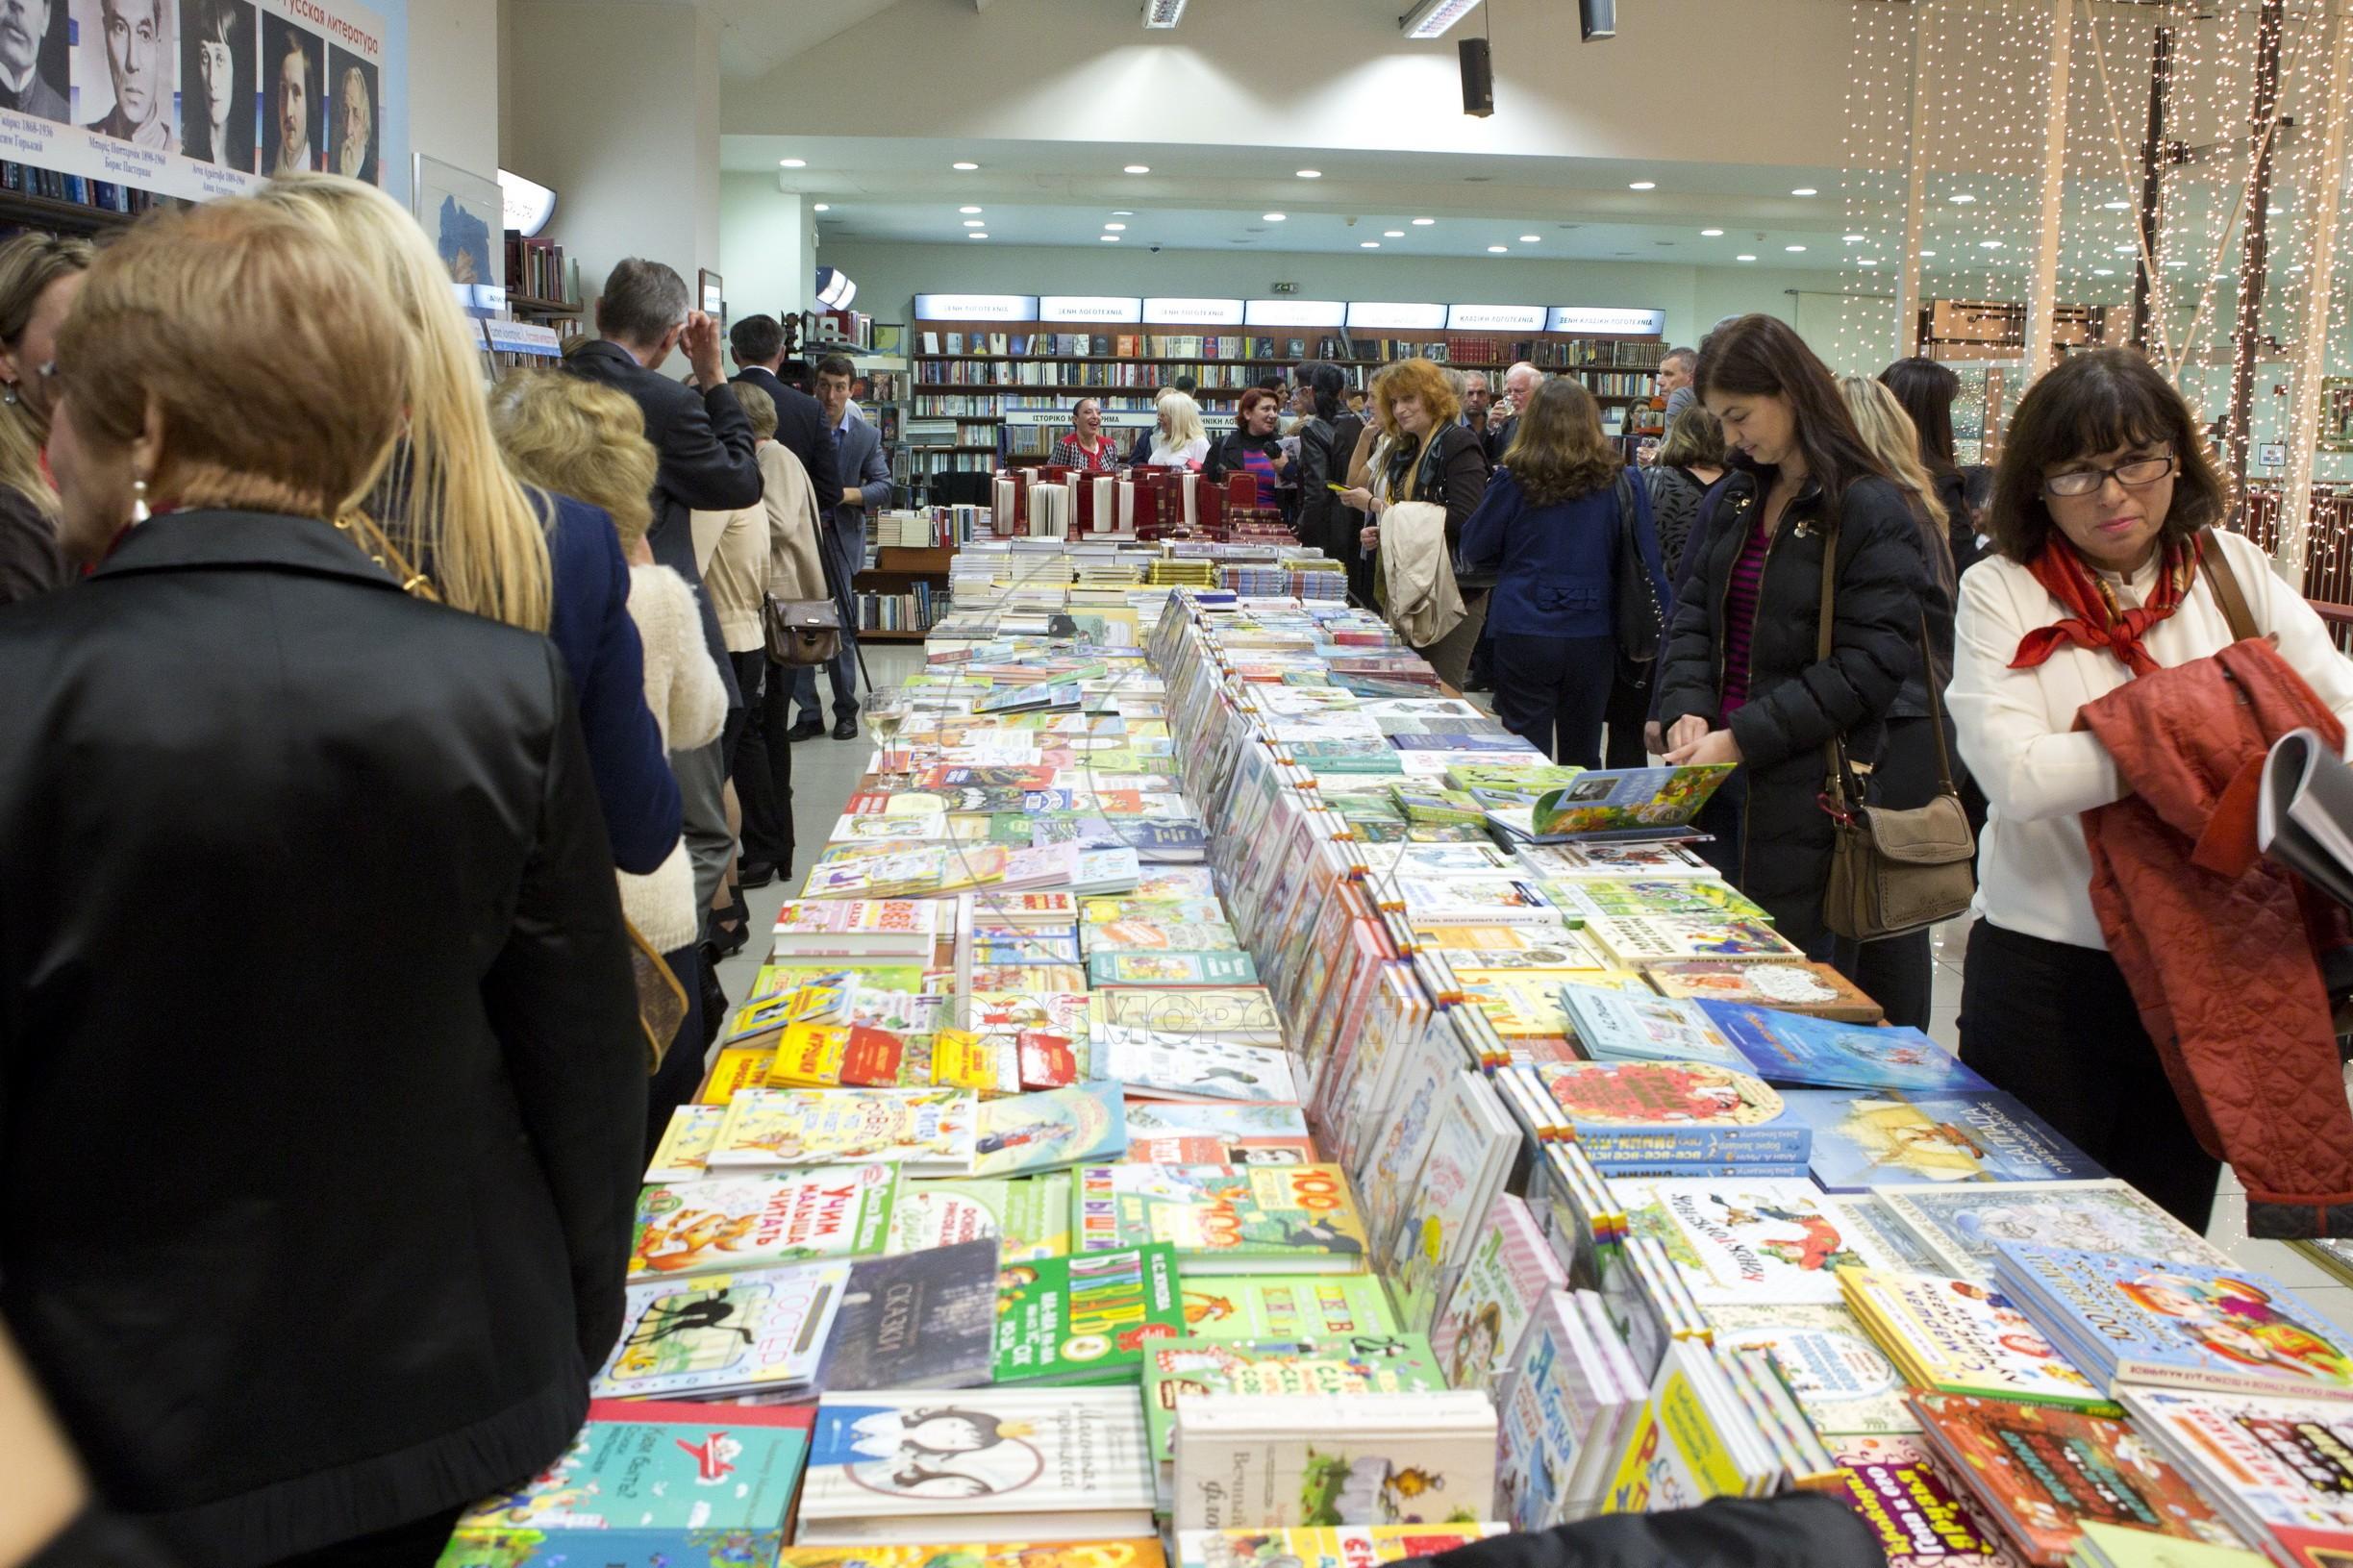 Eγκαίνια με τμήμα ρωσικής λογοτεχνίας στο βιβλιοπωλείο Μαλλιάρης ... 8fd627e5639